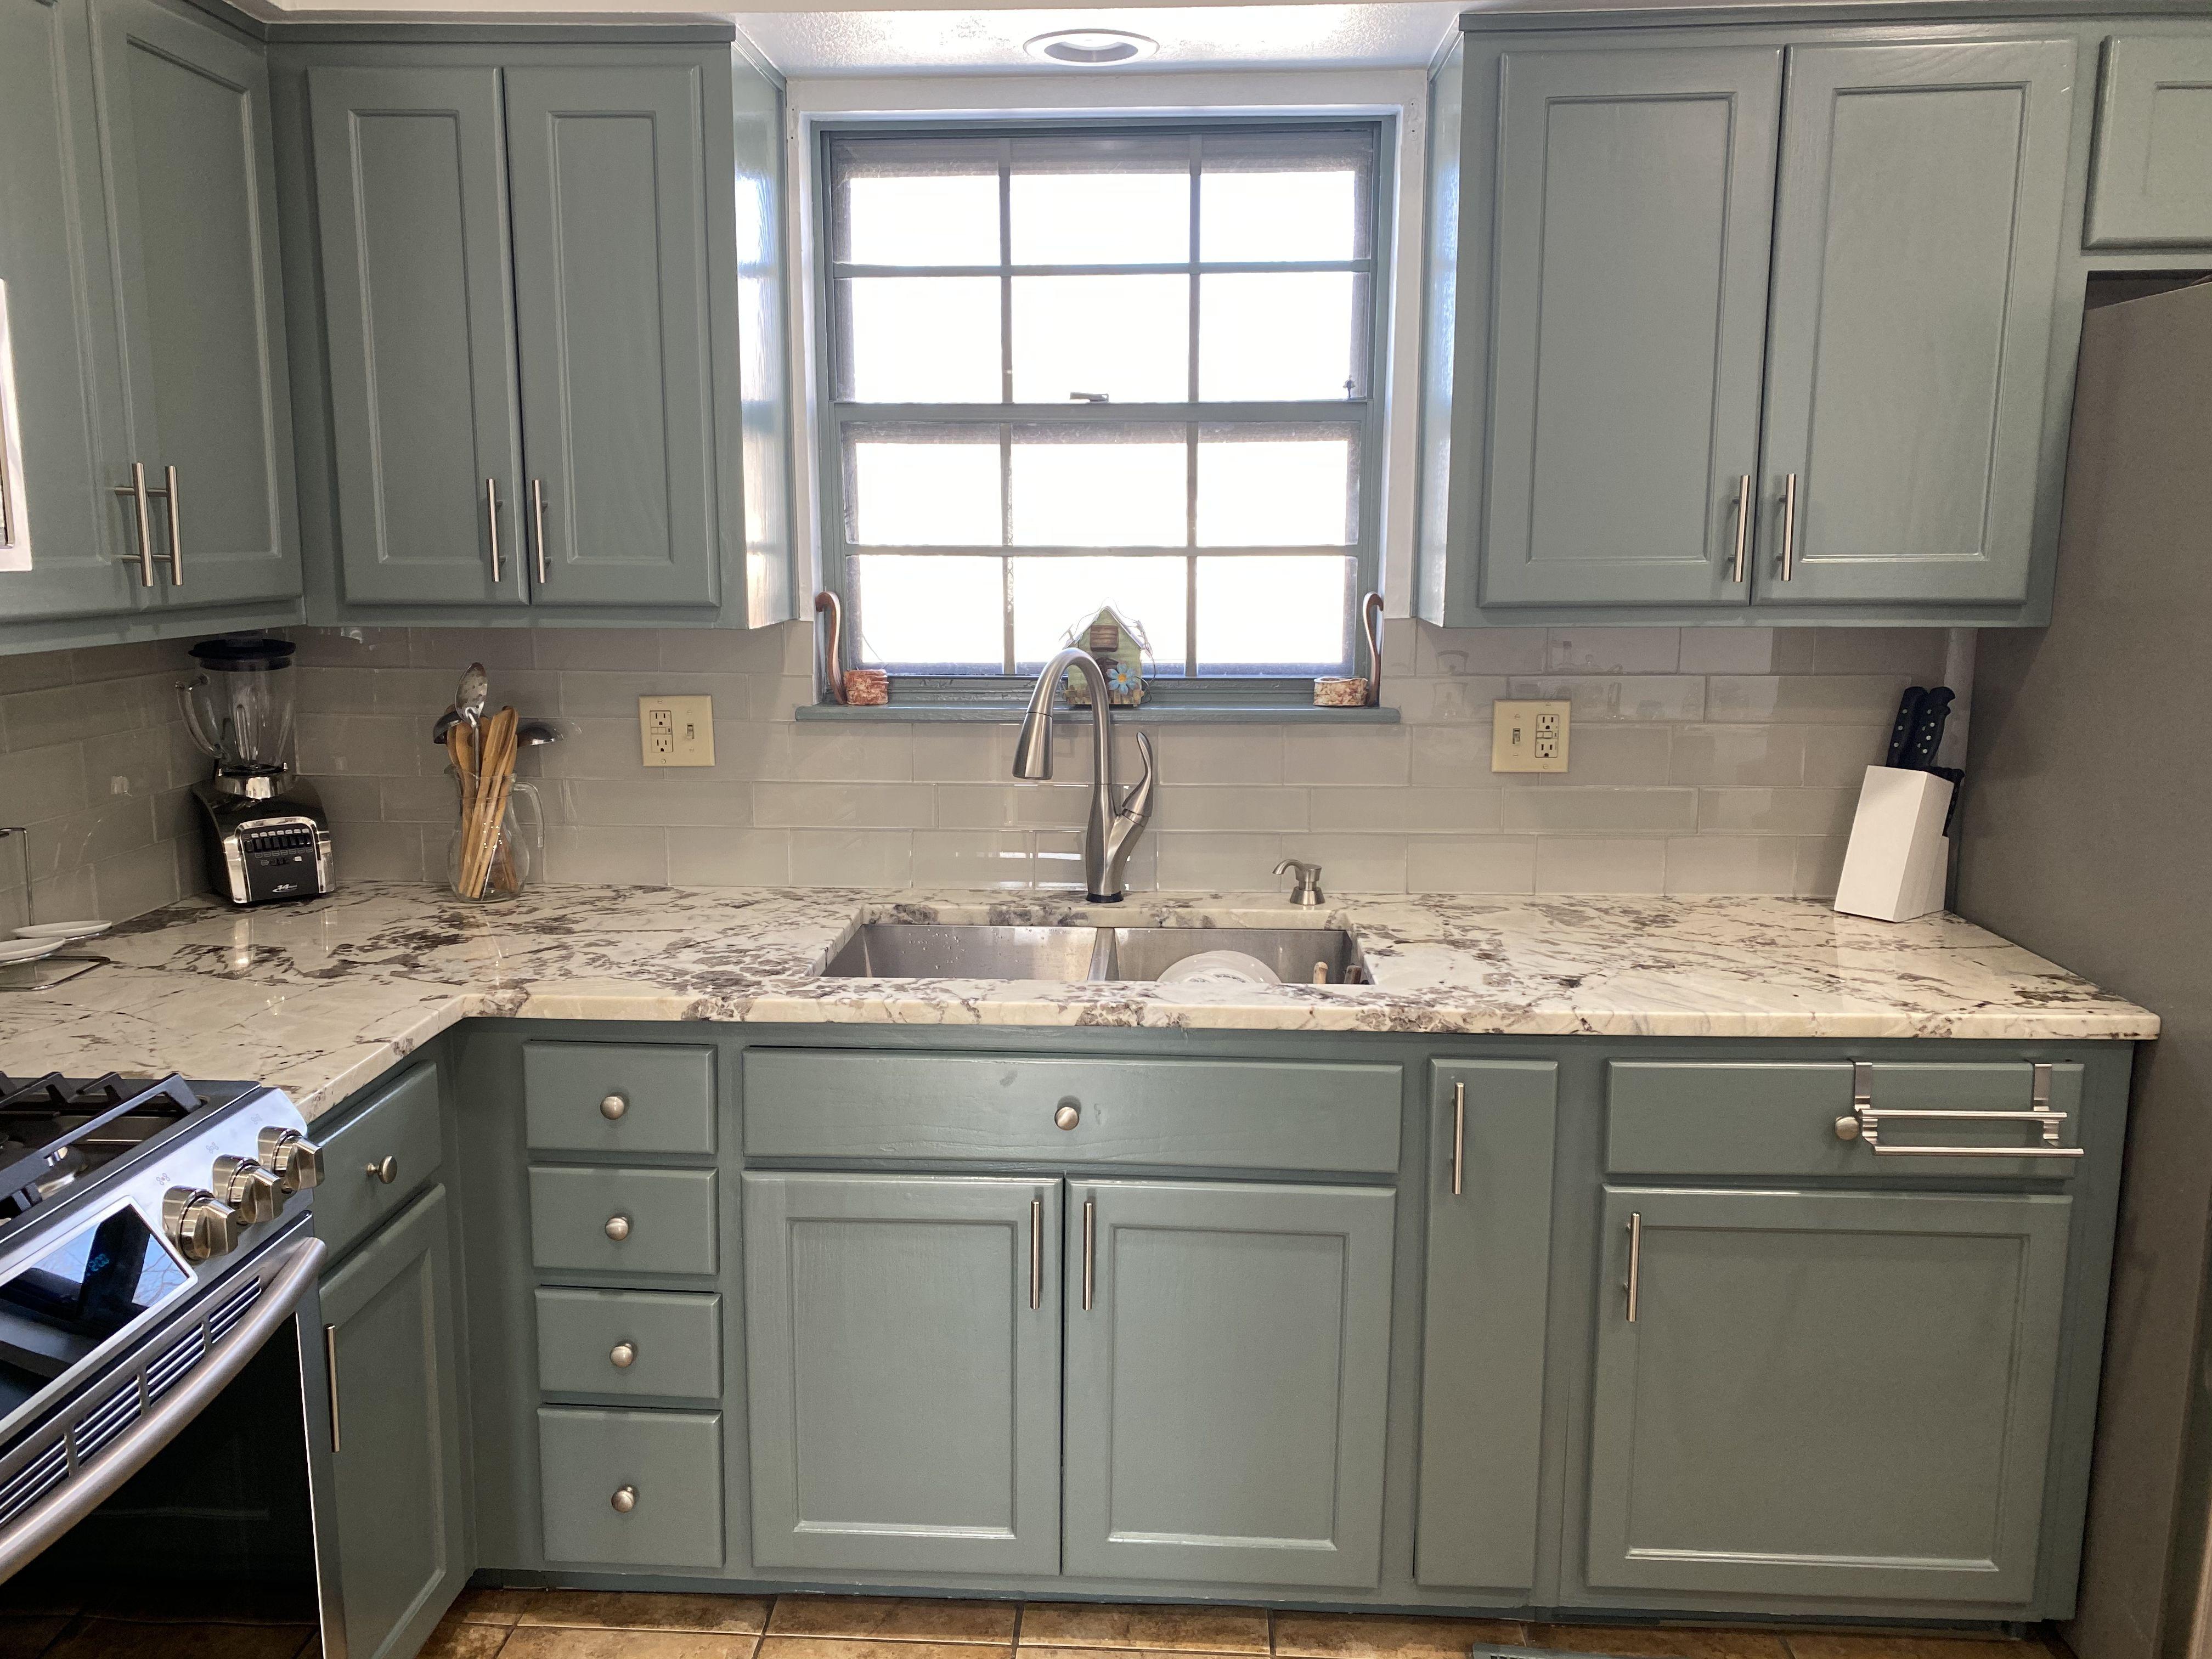 Cosina In 2020 Kitchen Kitchen Counter Kitchen Cabinets